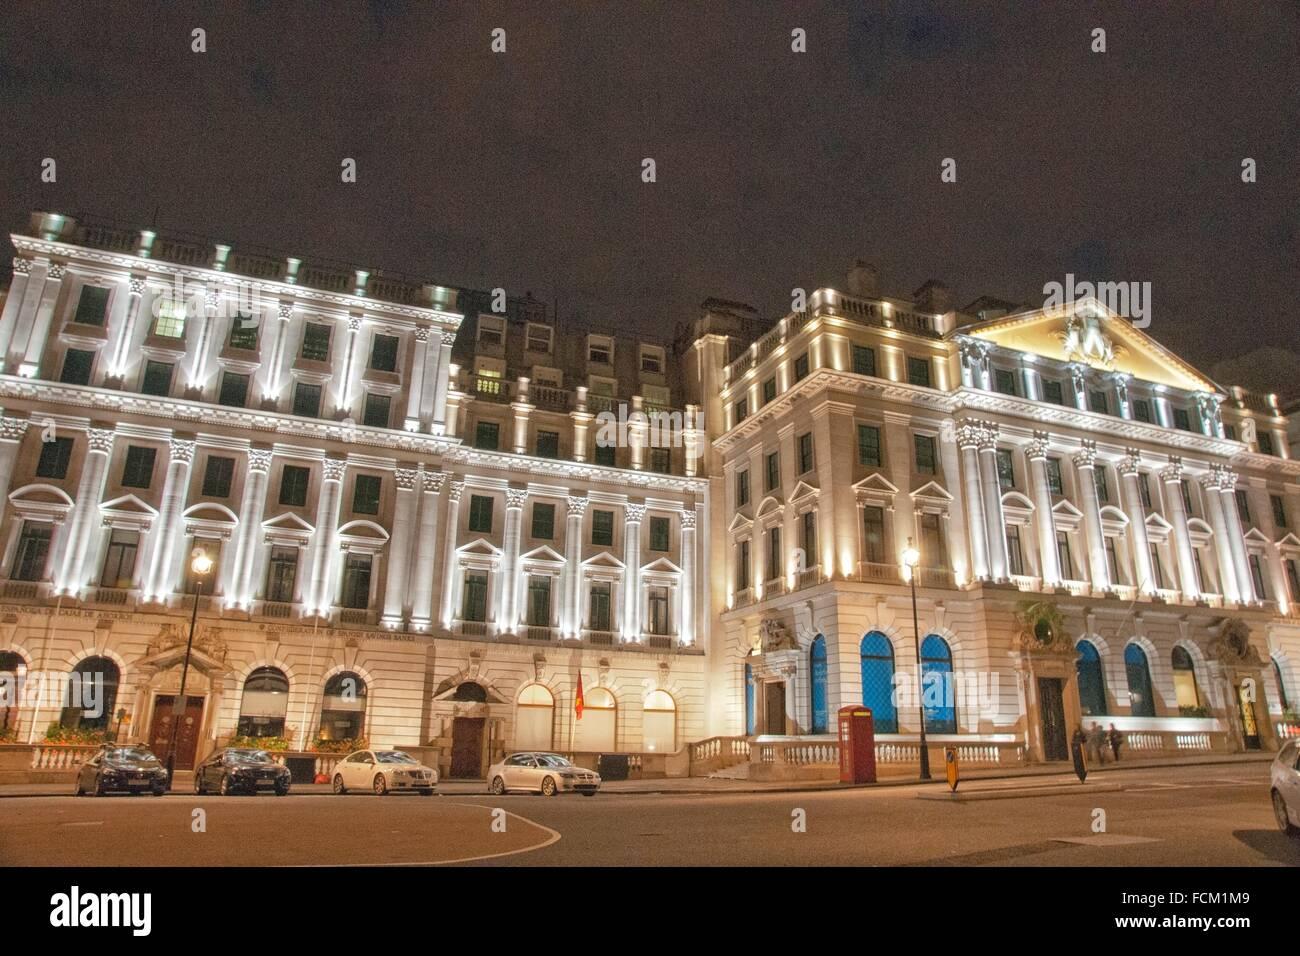 Villandry St James´s, london, england, uk, 12 Waterloo Place - Stock Image